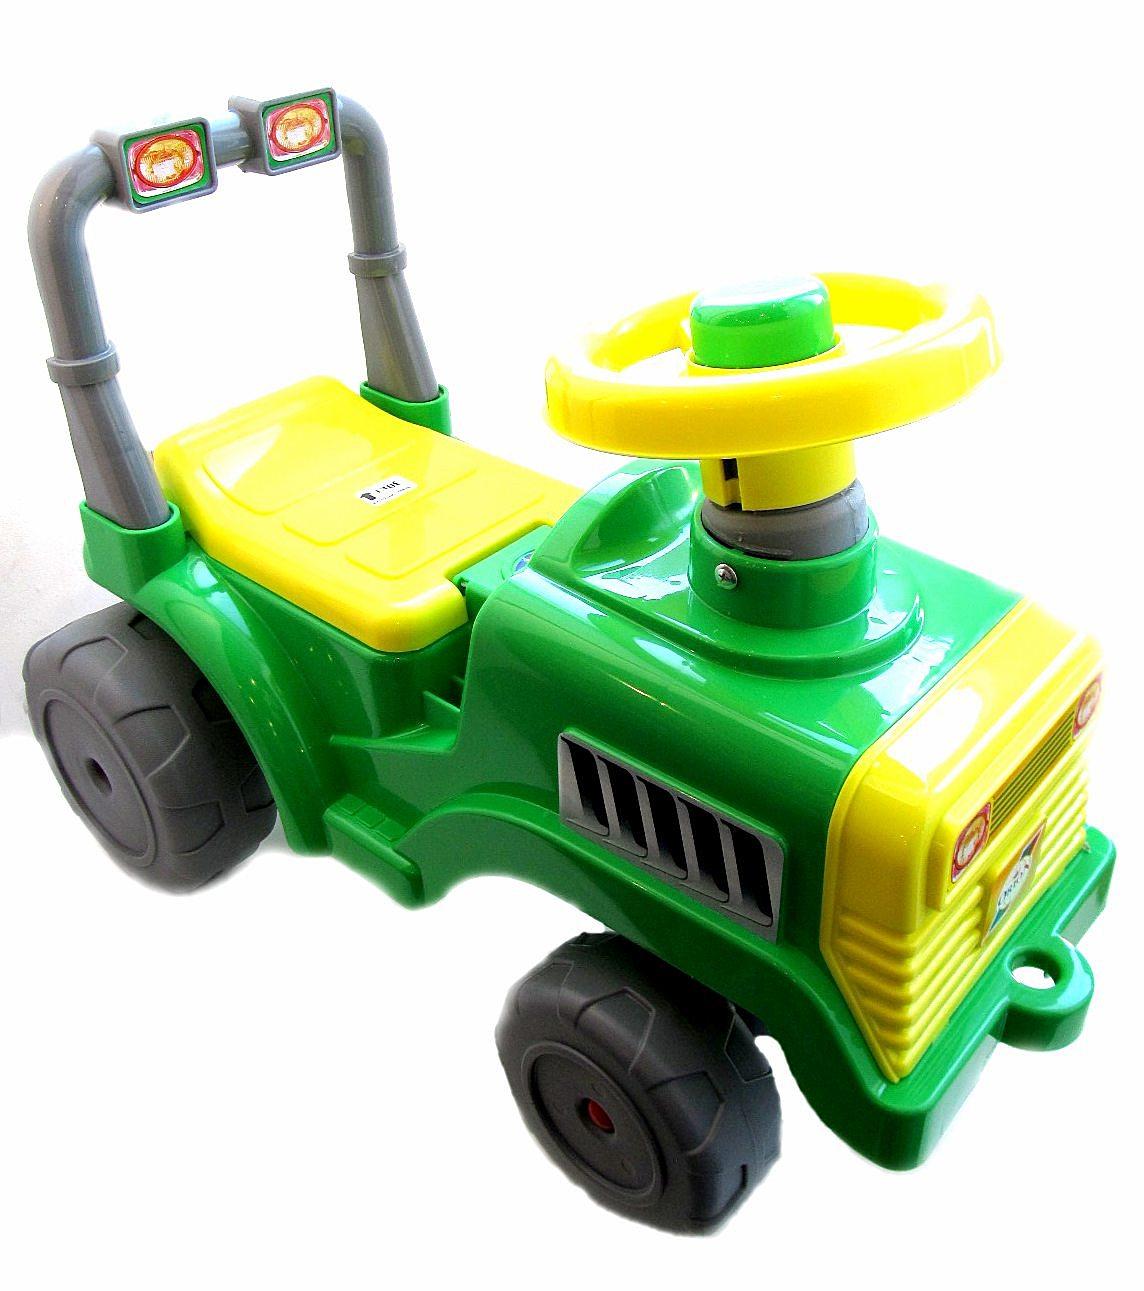 Каталка Бэби Трактор 931 зеленая